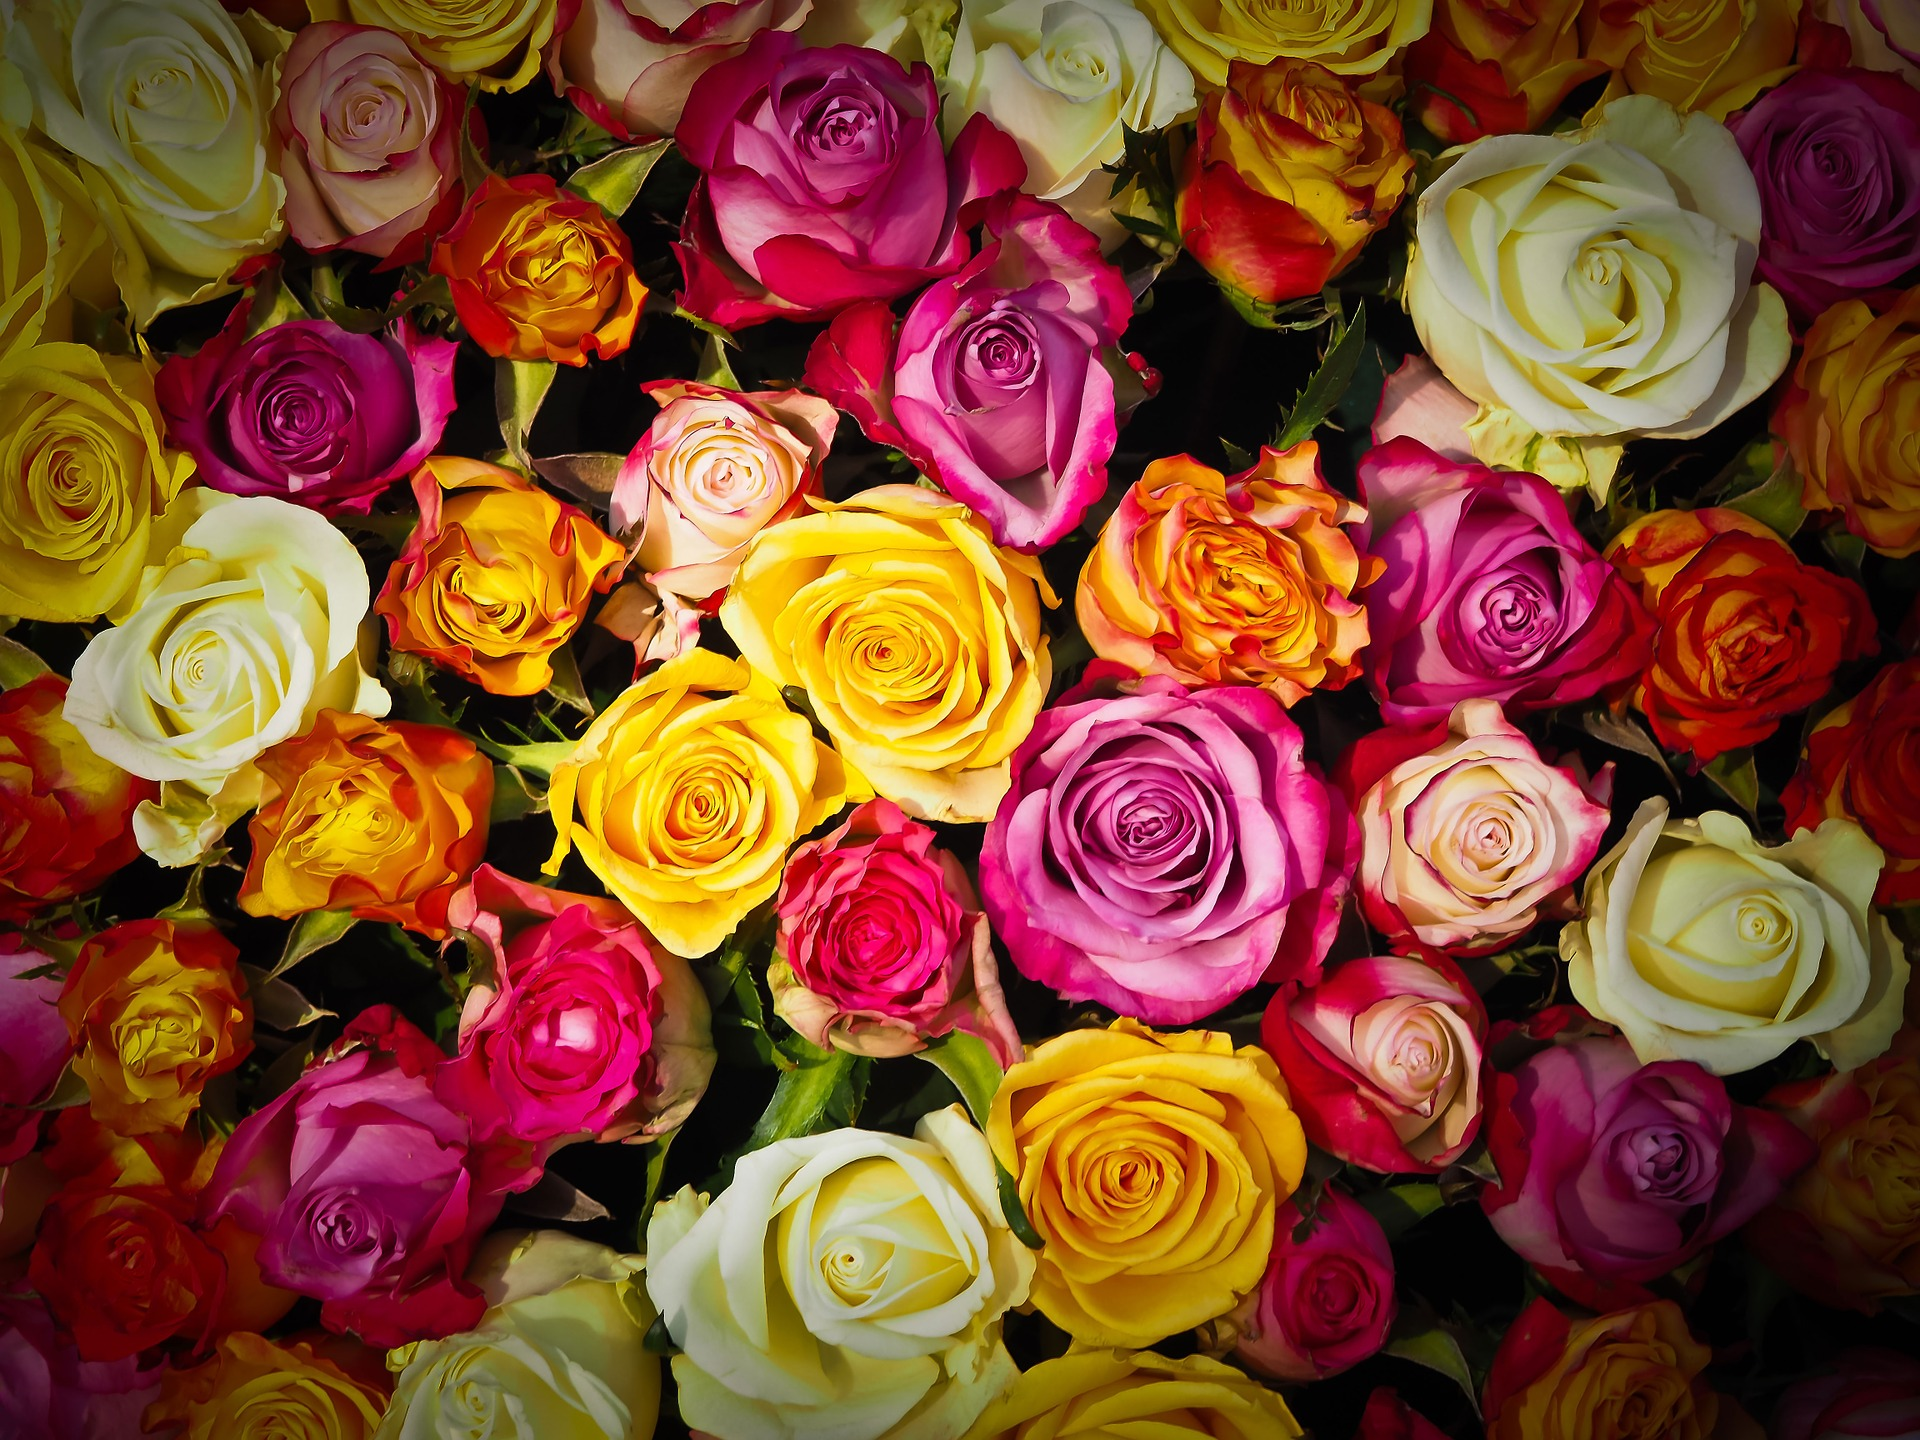 roses-1229148_1920